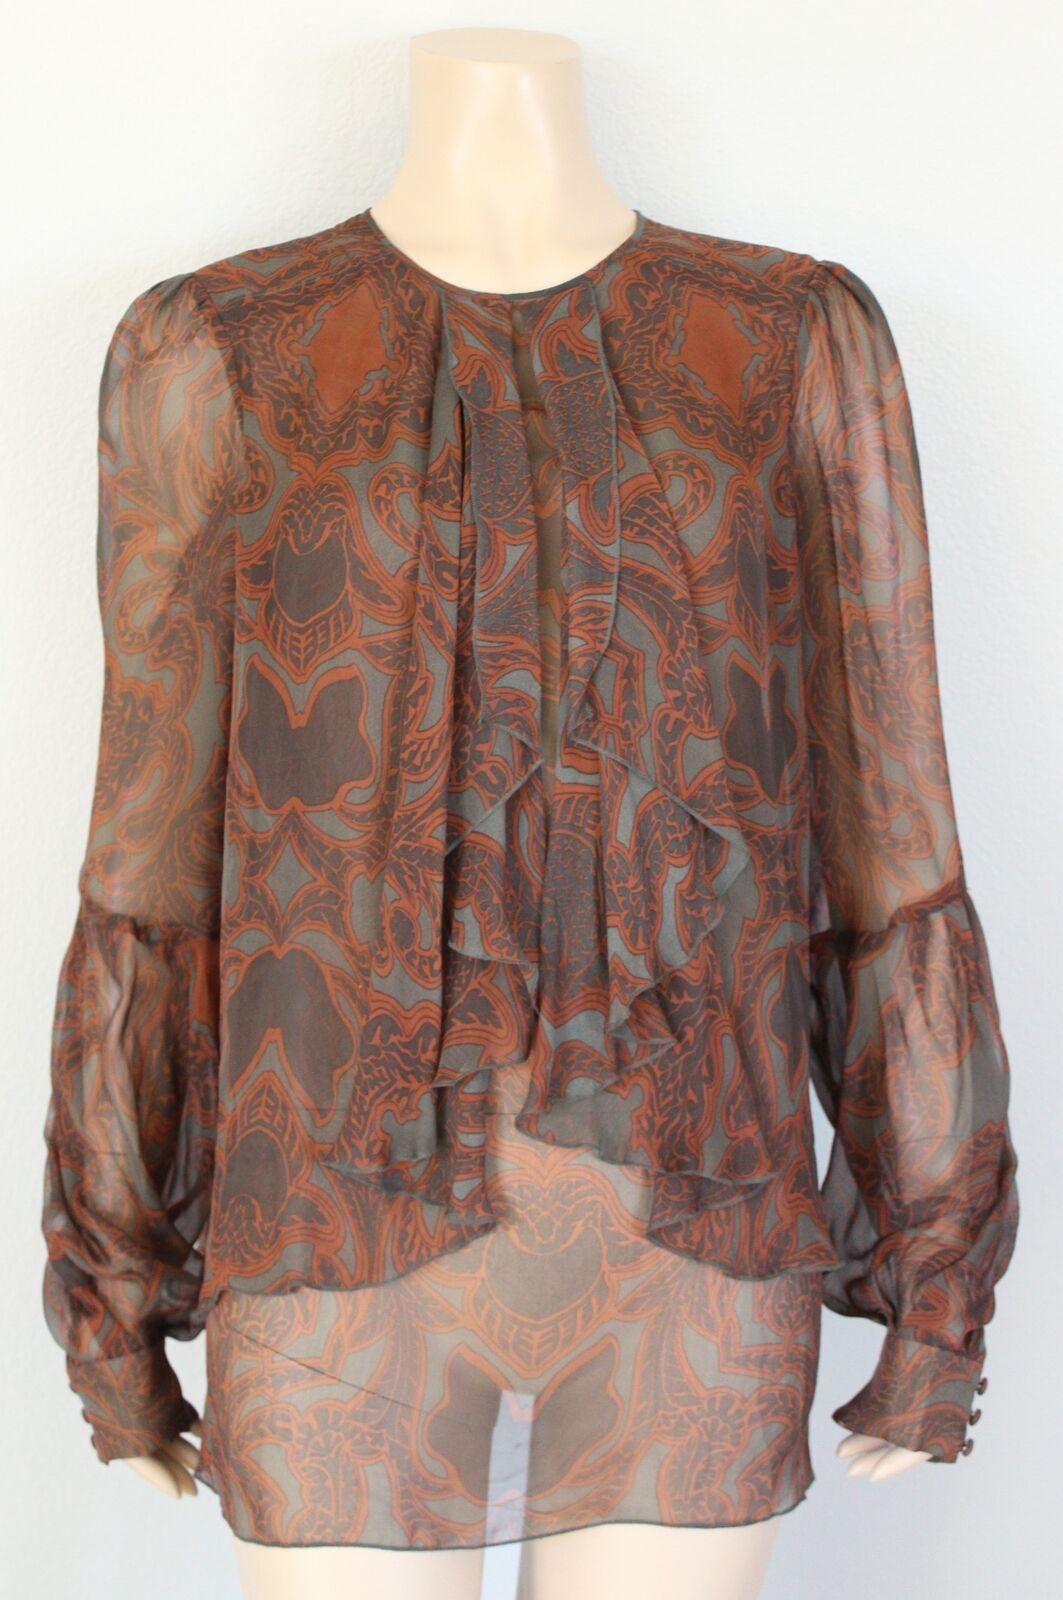 PROENZA SCHOULER 100% Silk Sheer Ruffled Bishop Sleeve Top, Größe 6